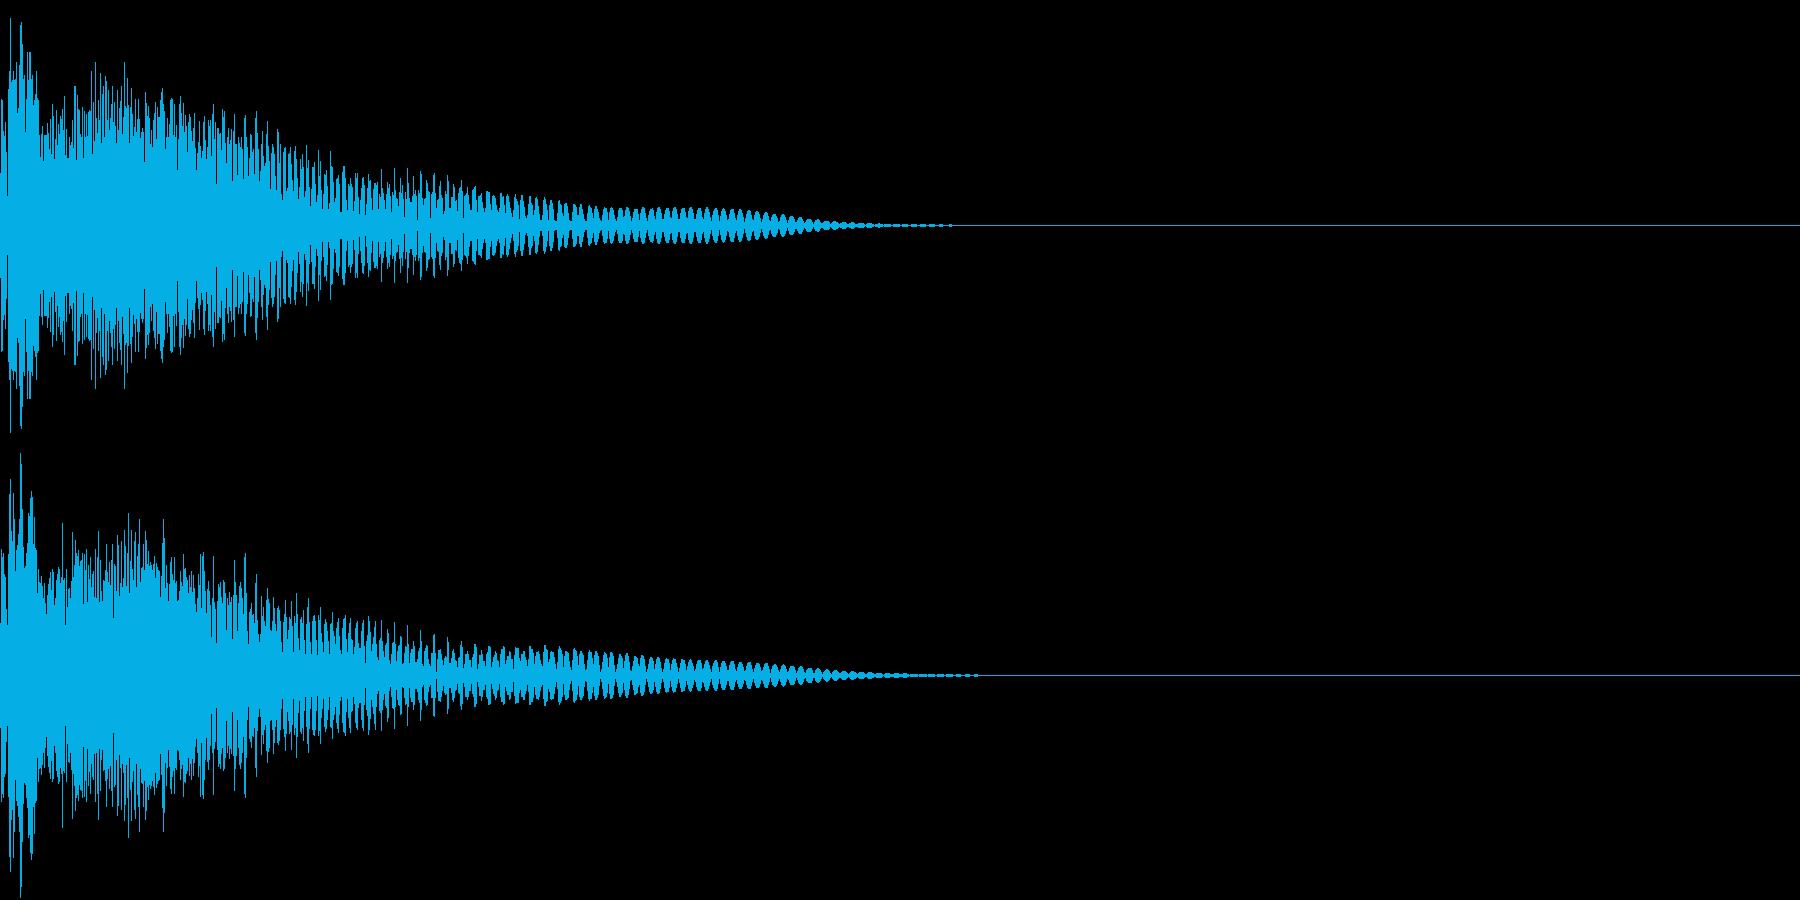 GAME 汎用性の高い攻撃音・ダメージ音の再生済みの波形